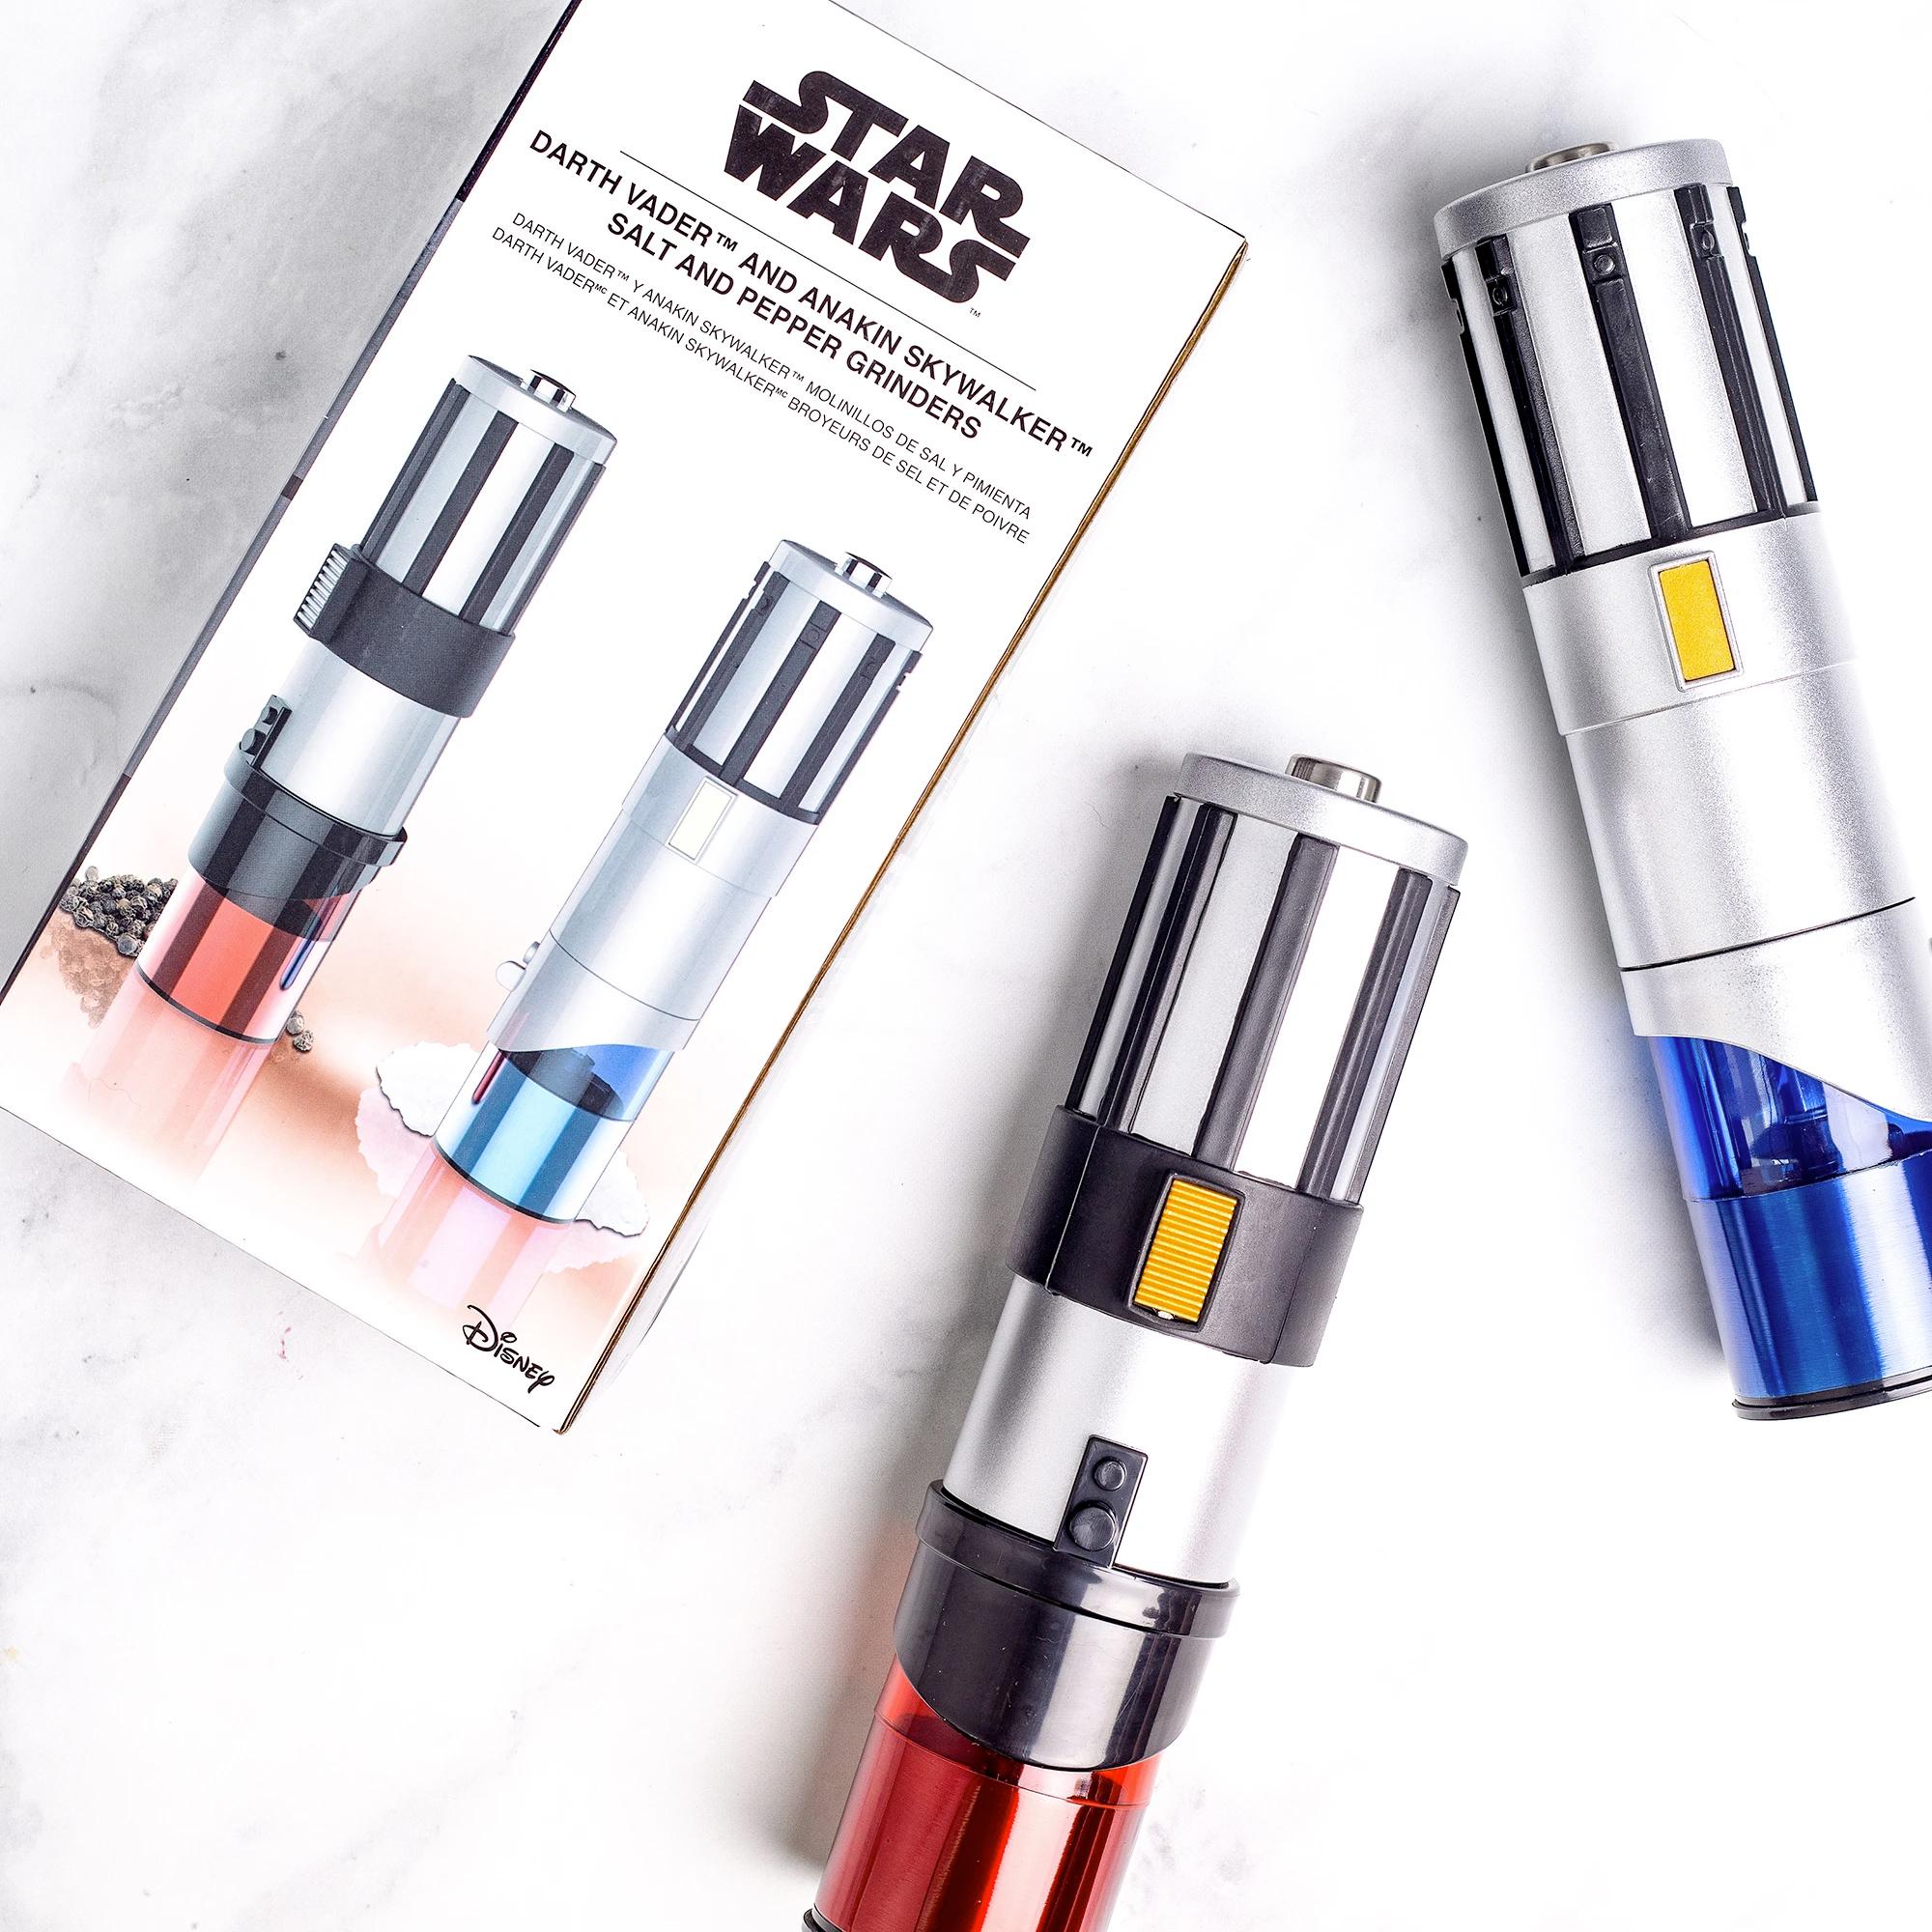 Star Wars Lightsabers Eletric Salt and Pepper Mill Grinders